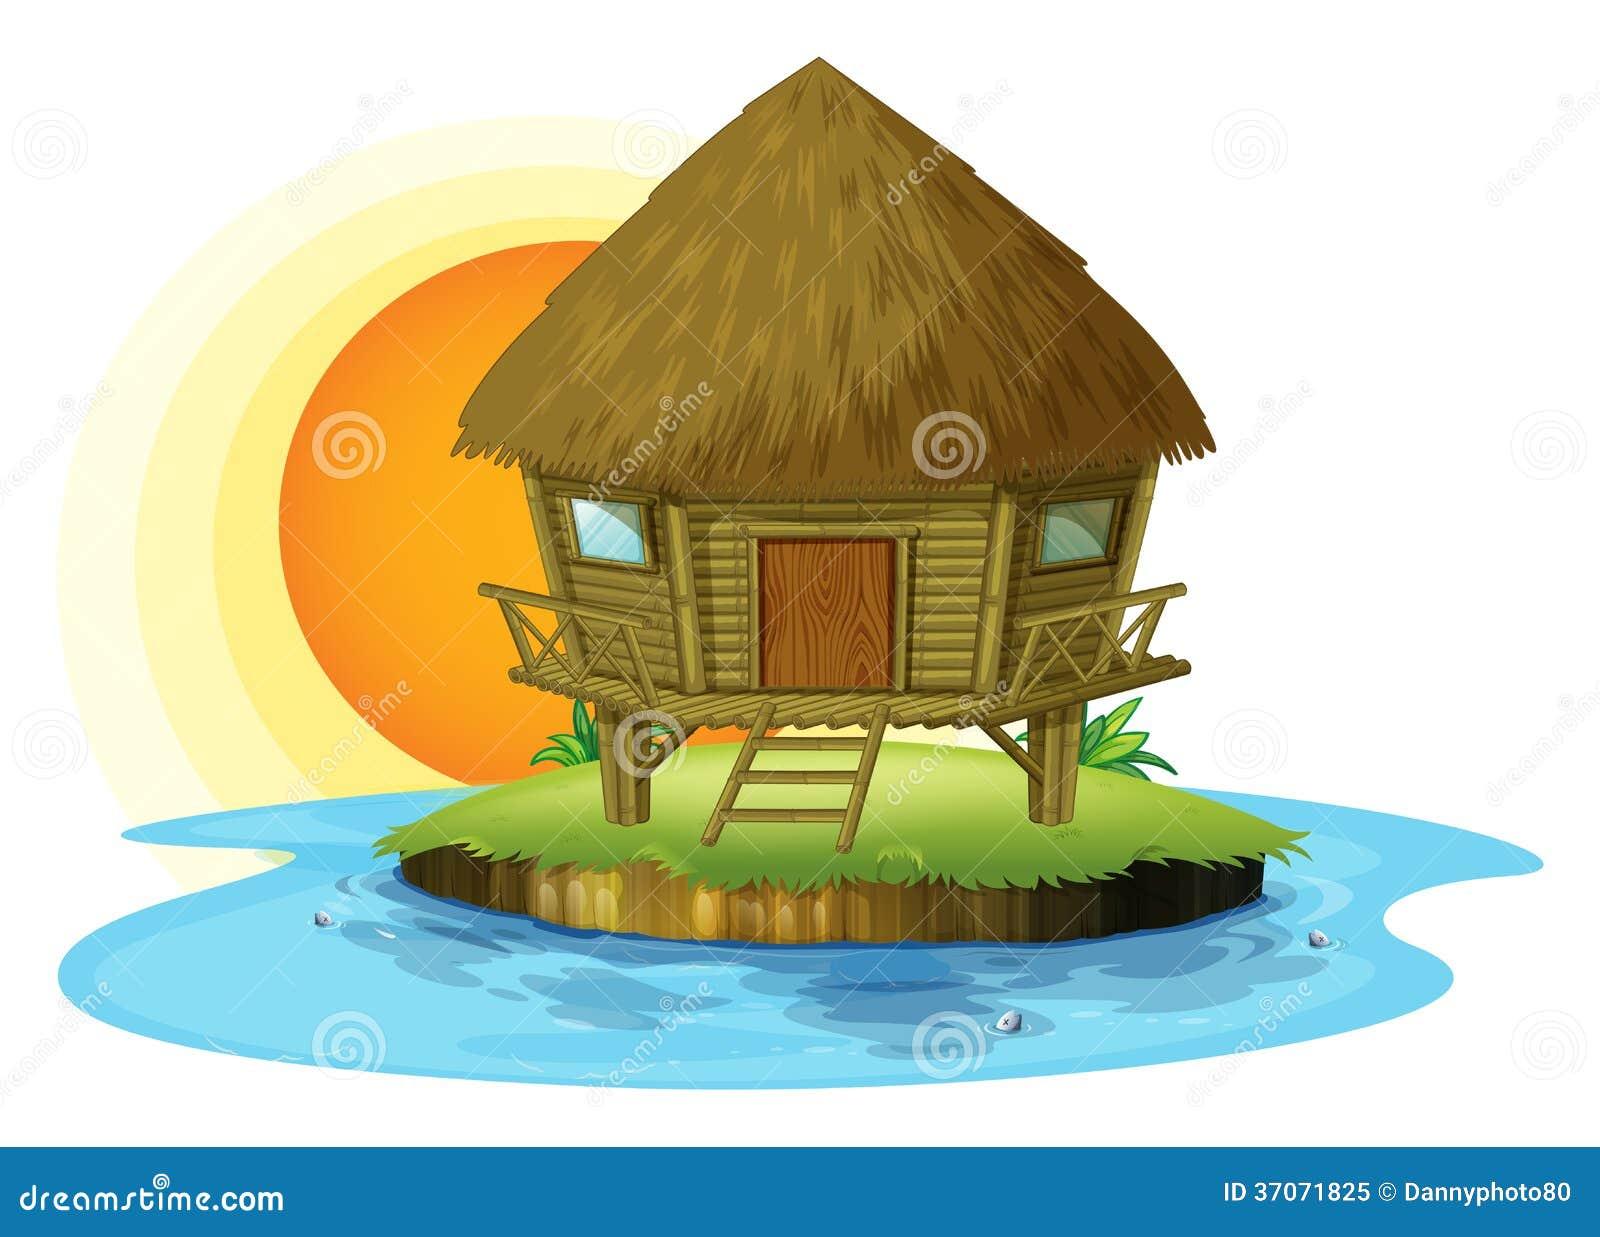 A Small Nipa Hut In An Island Stock Image Cartoondealer